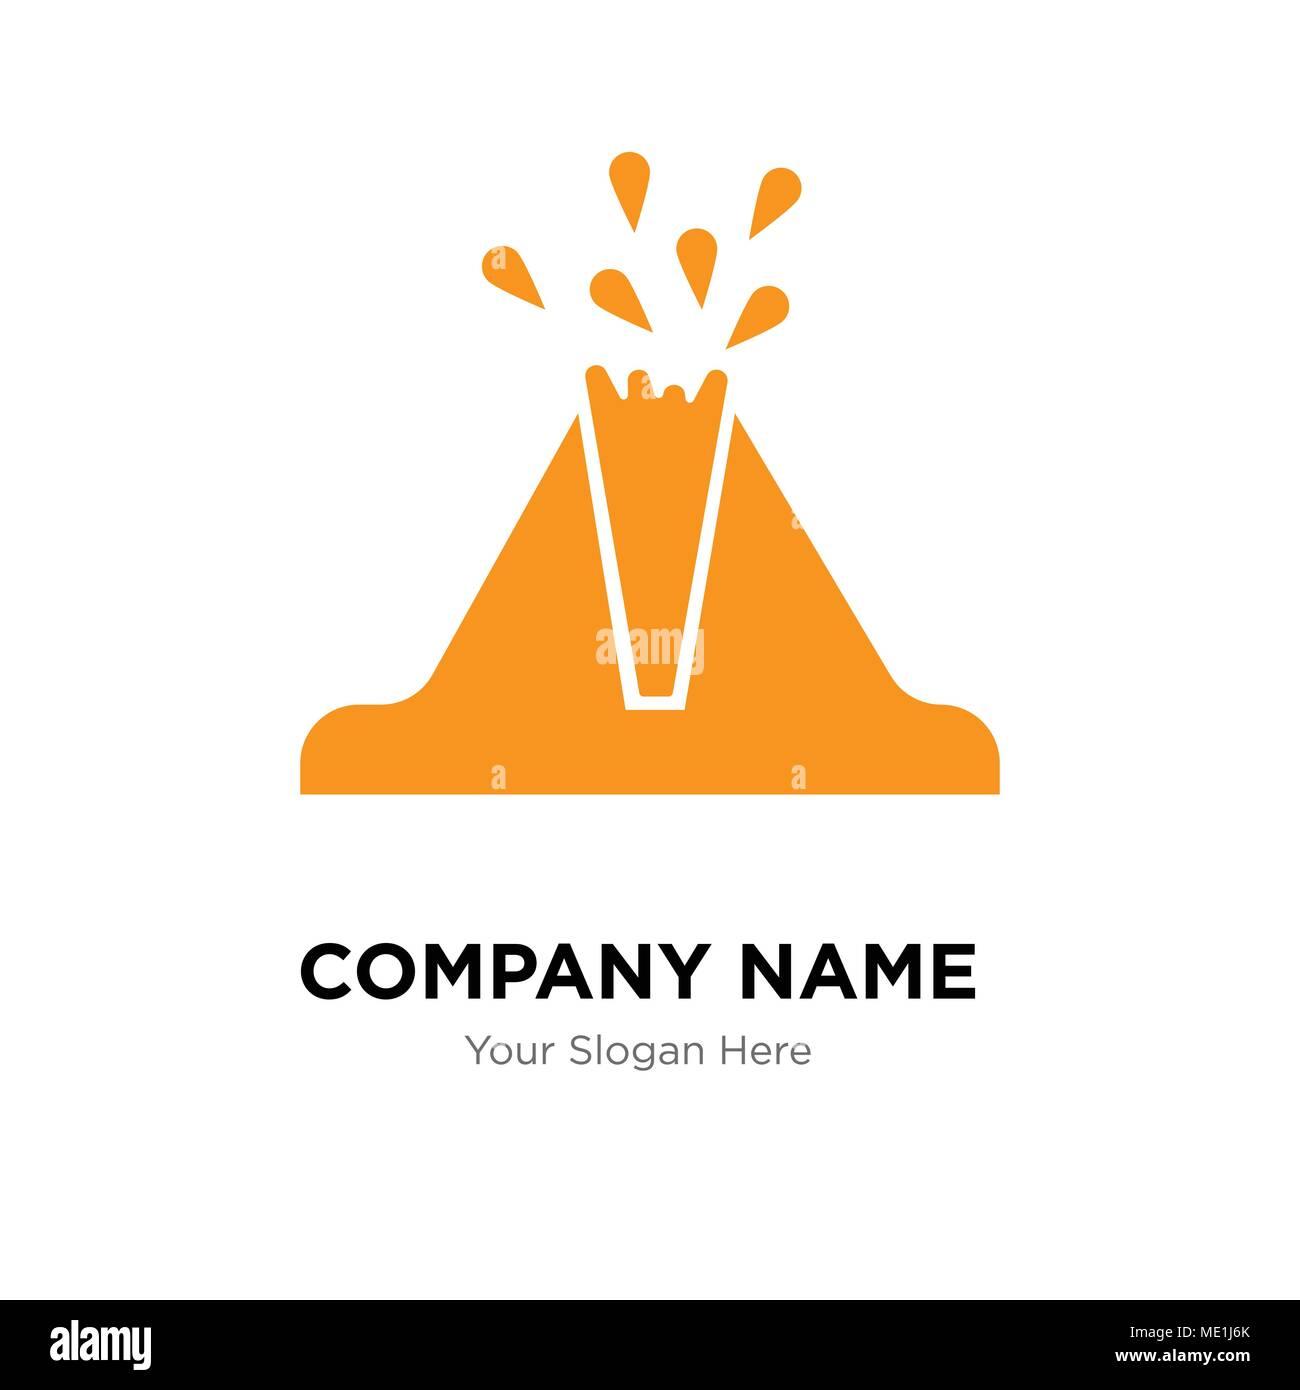 Volcano company logo design template business corporate vector icon volcano company logo design template business corporate vector icon maxwellsz